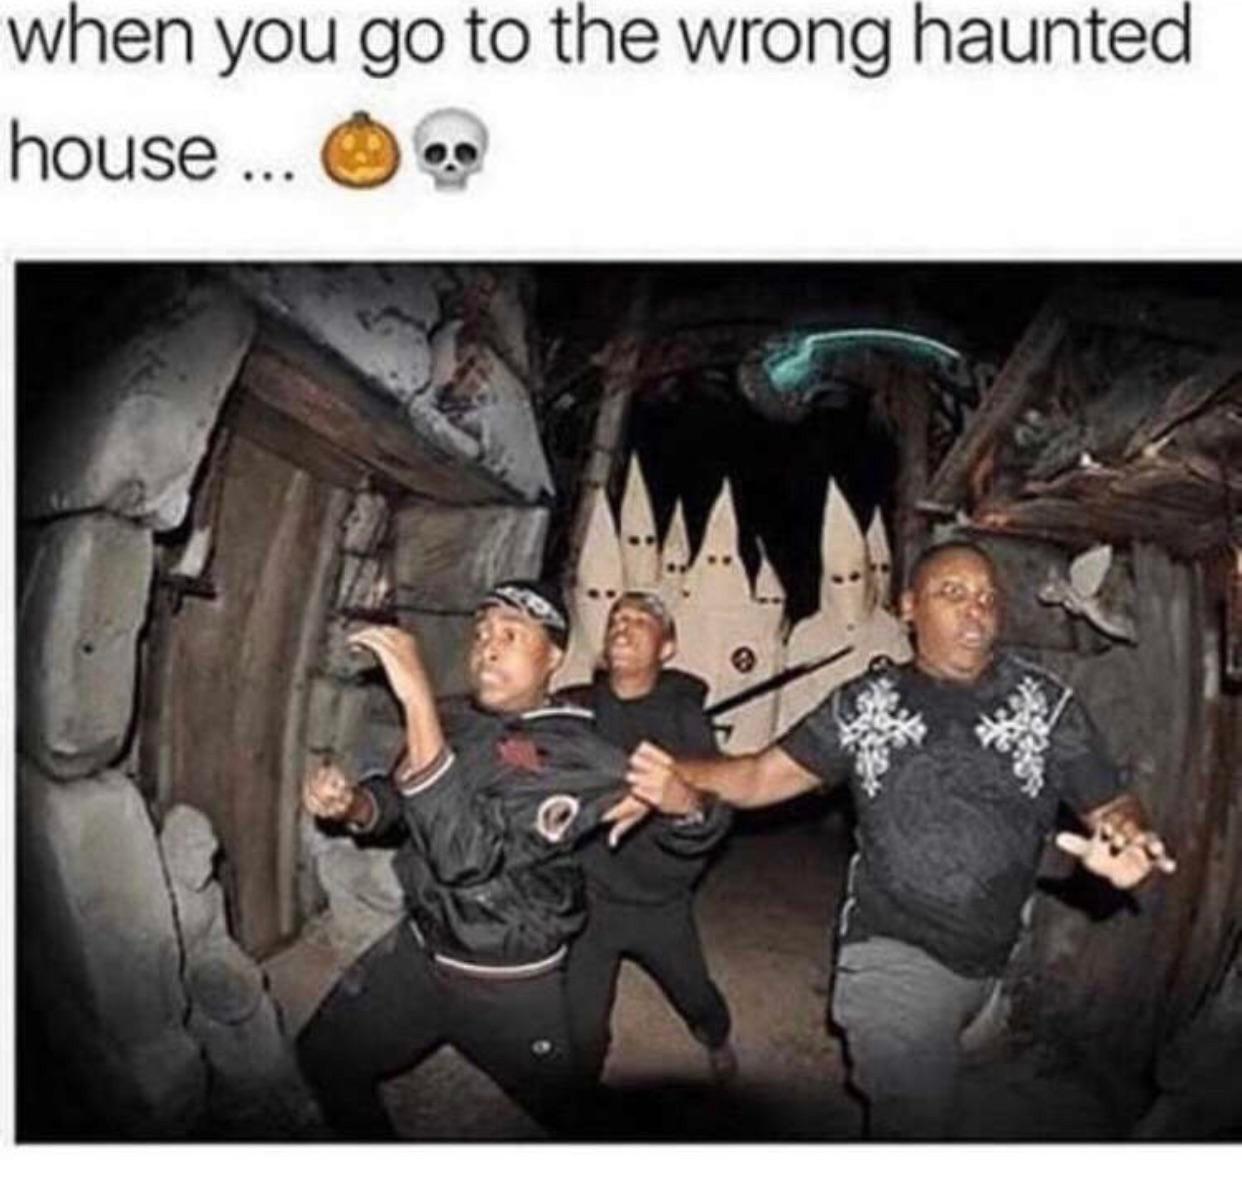 spooky times - meme